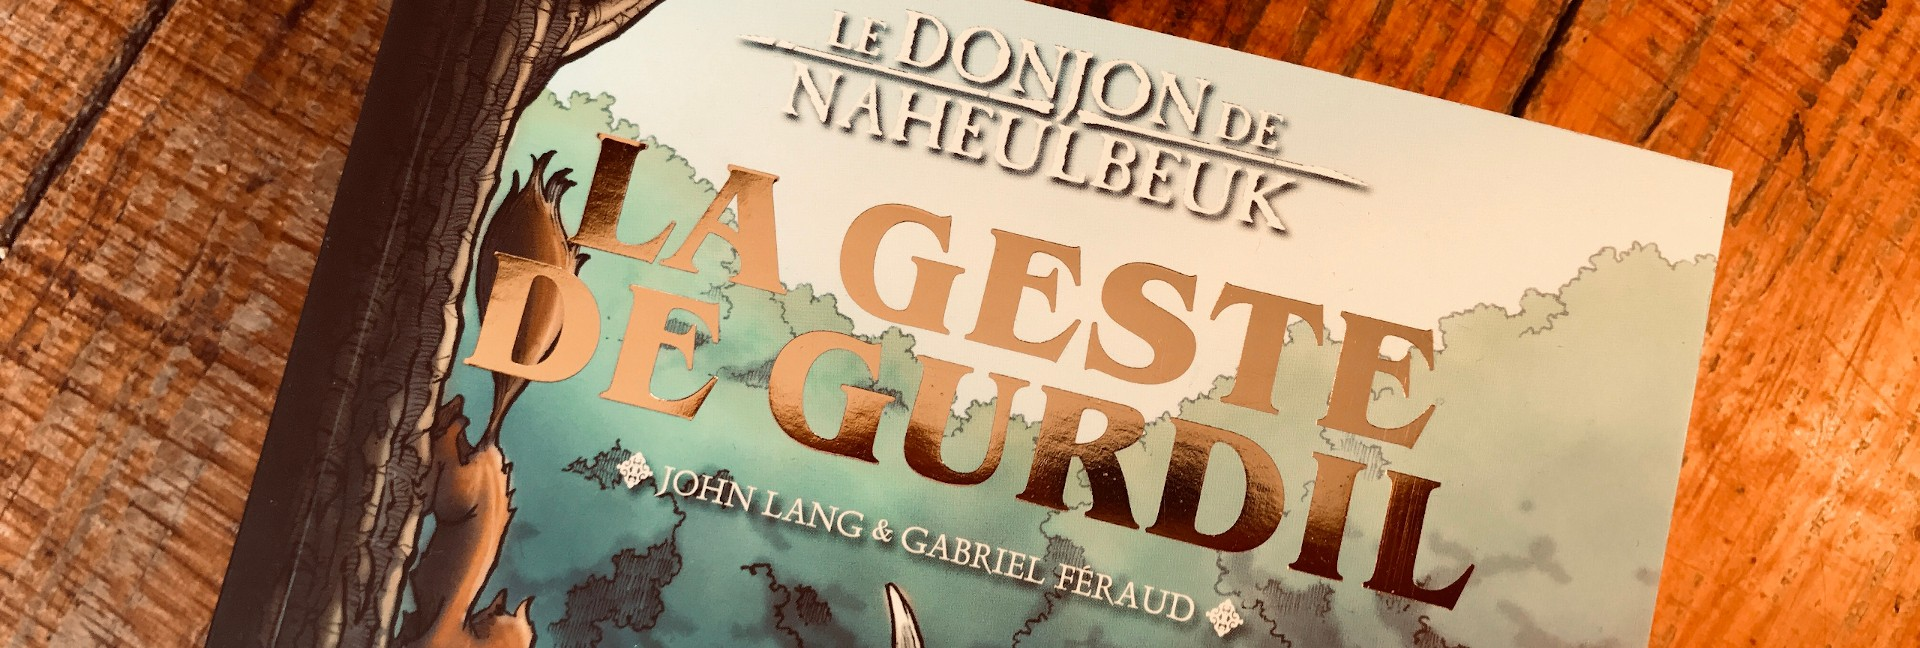 LE DONJON DE NAHEULBEUK de JOHN LANG